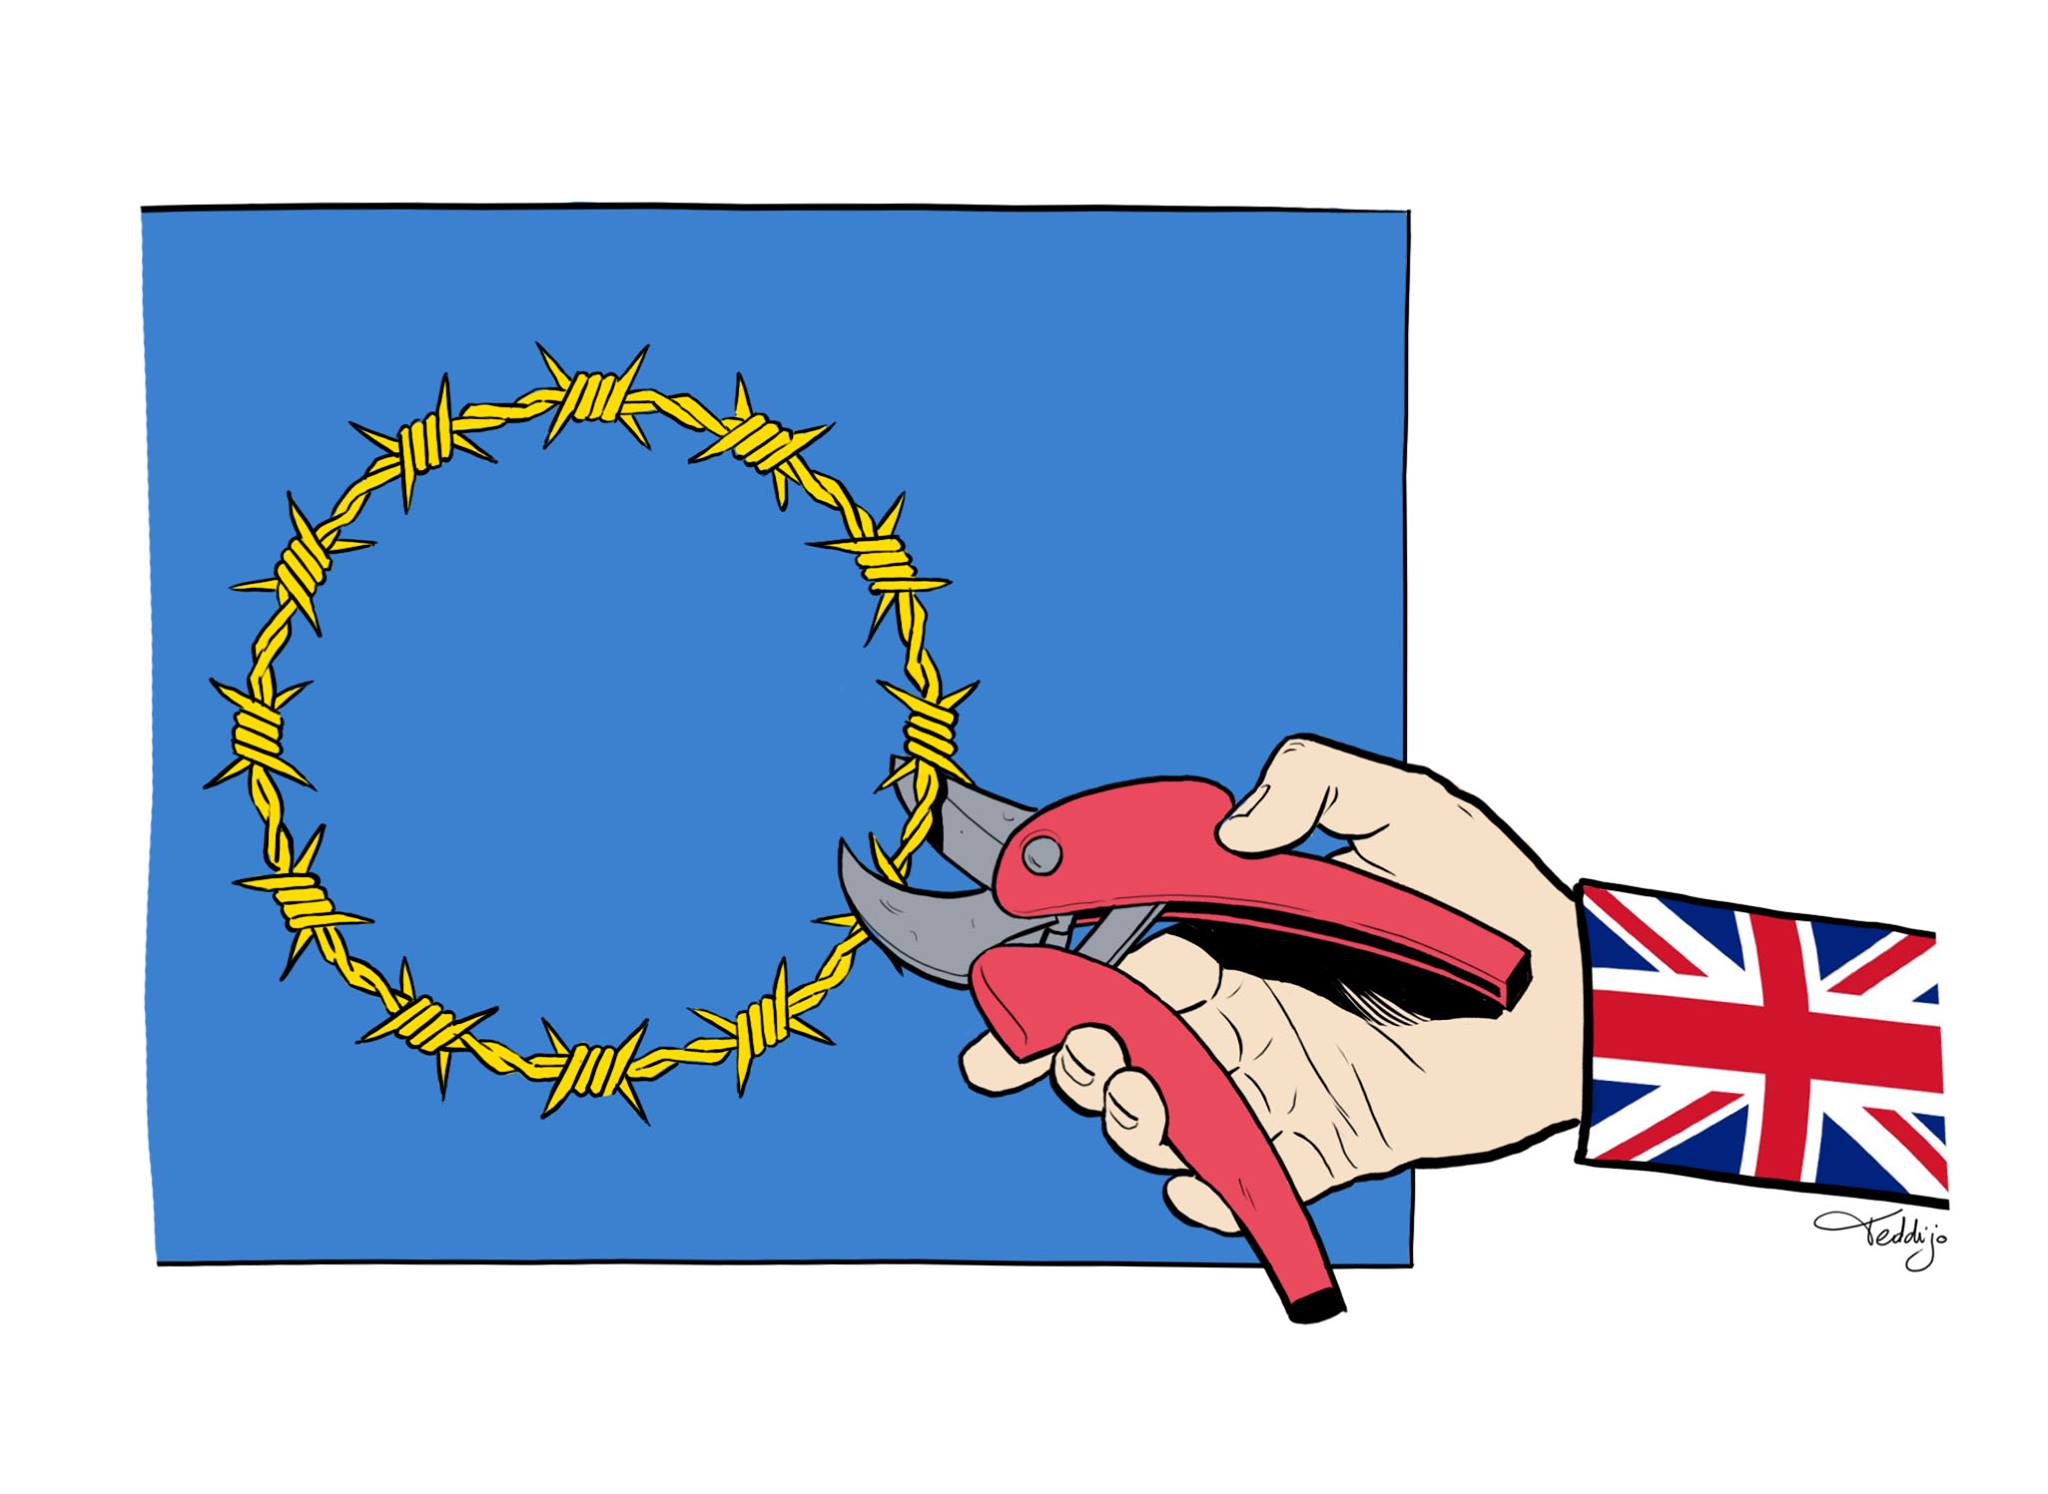 Teddijo_dessin_brexit_europe_ue